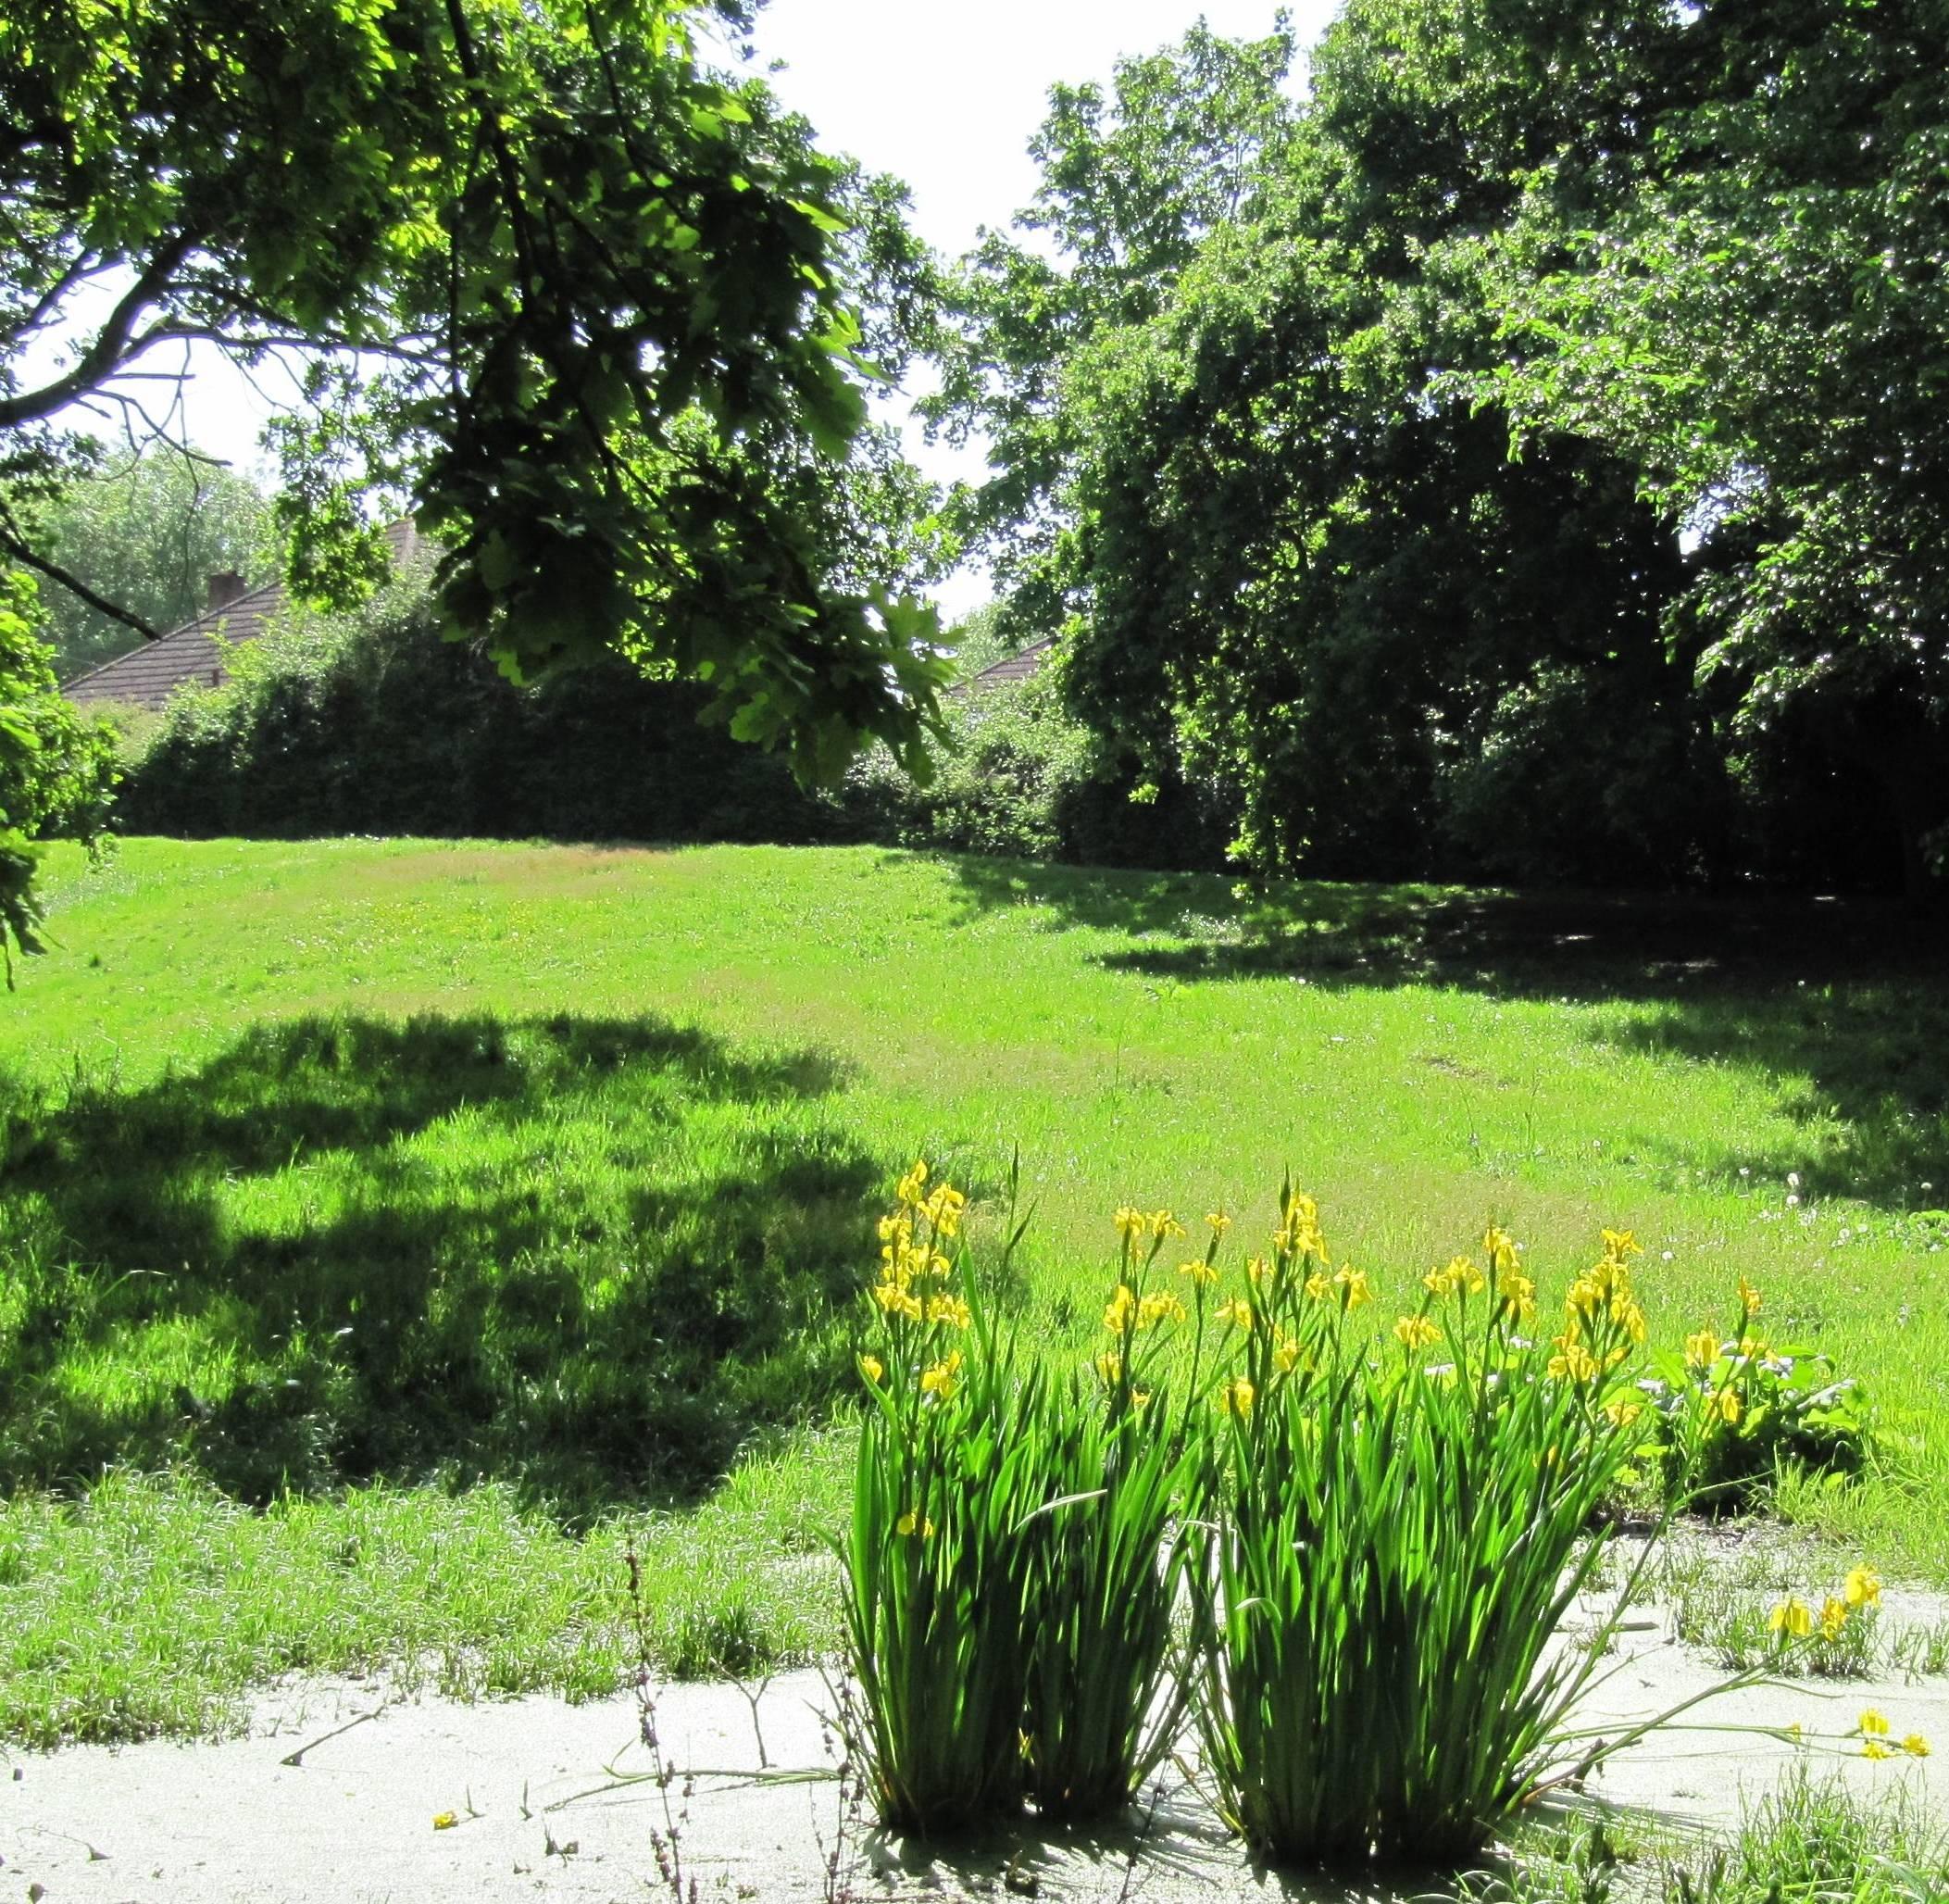 privett-road-irises-adele